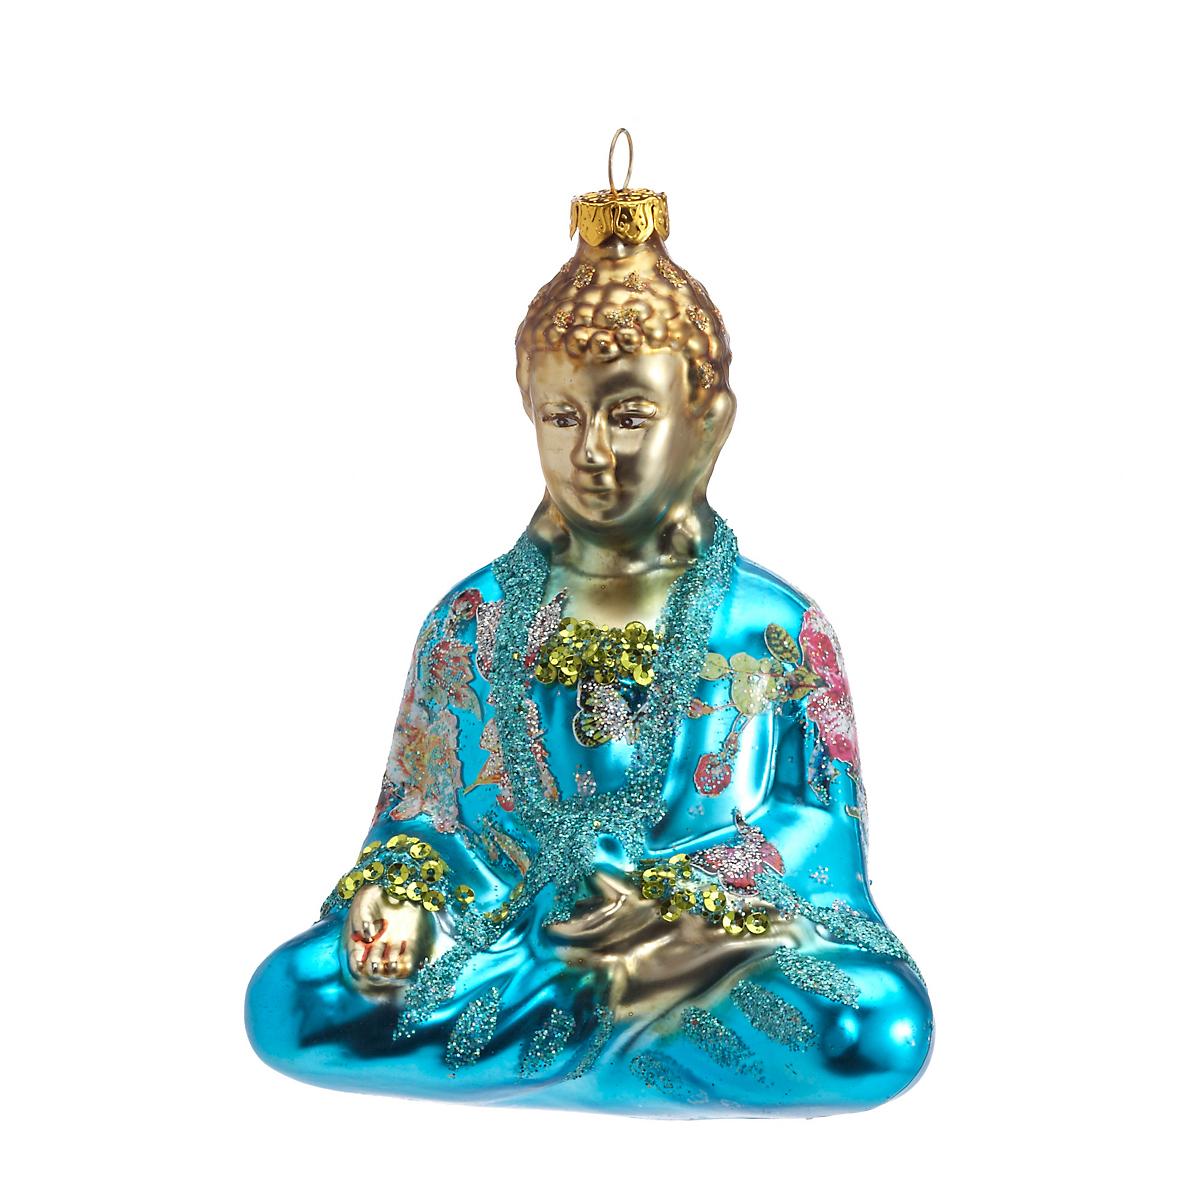 Turquoise Buddha Christmas Ornament | Gump's